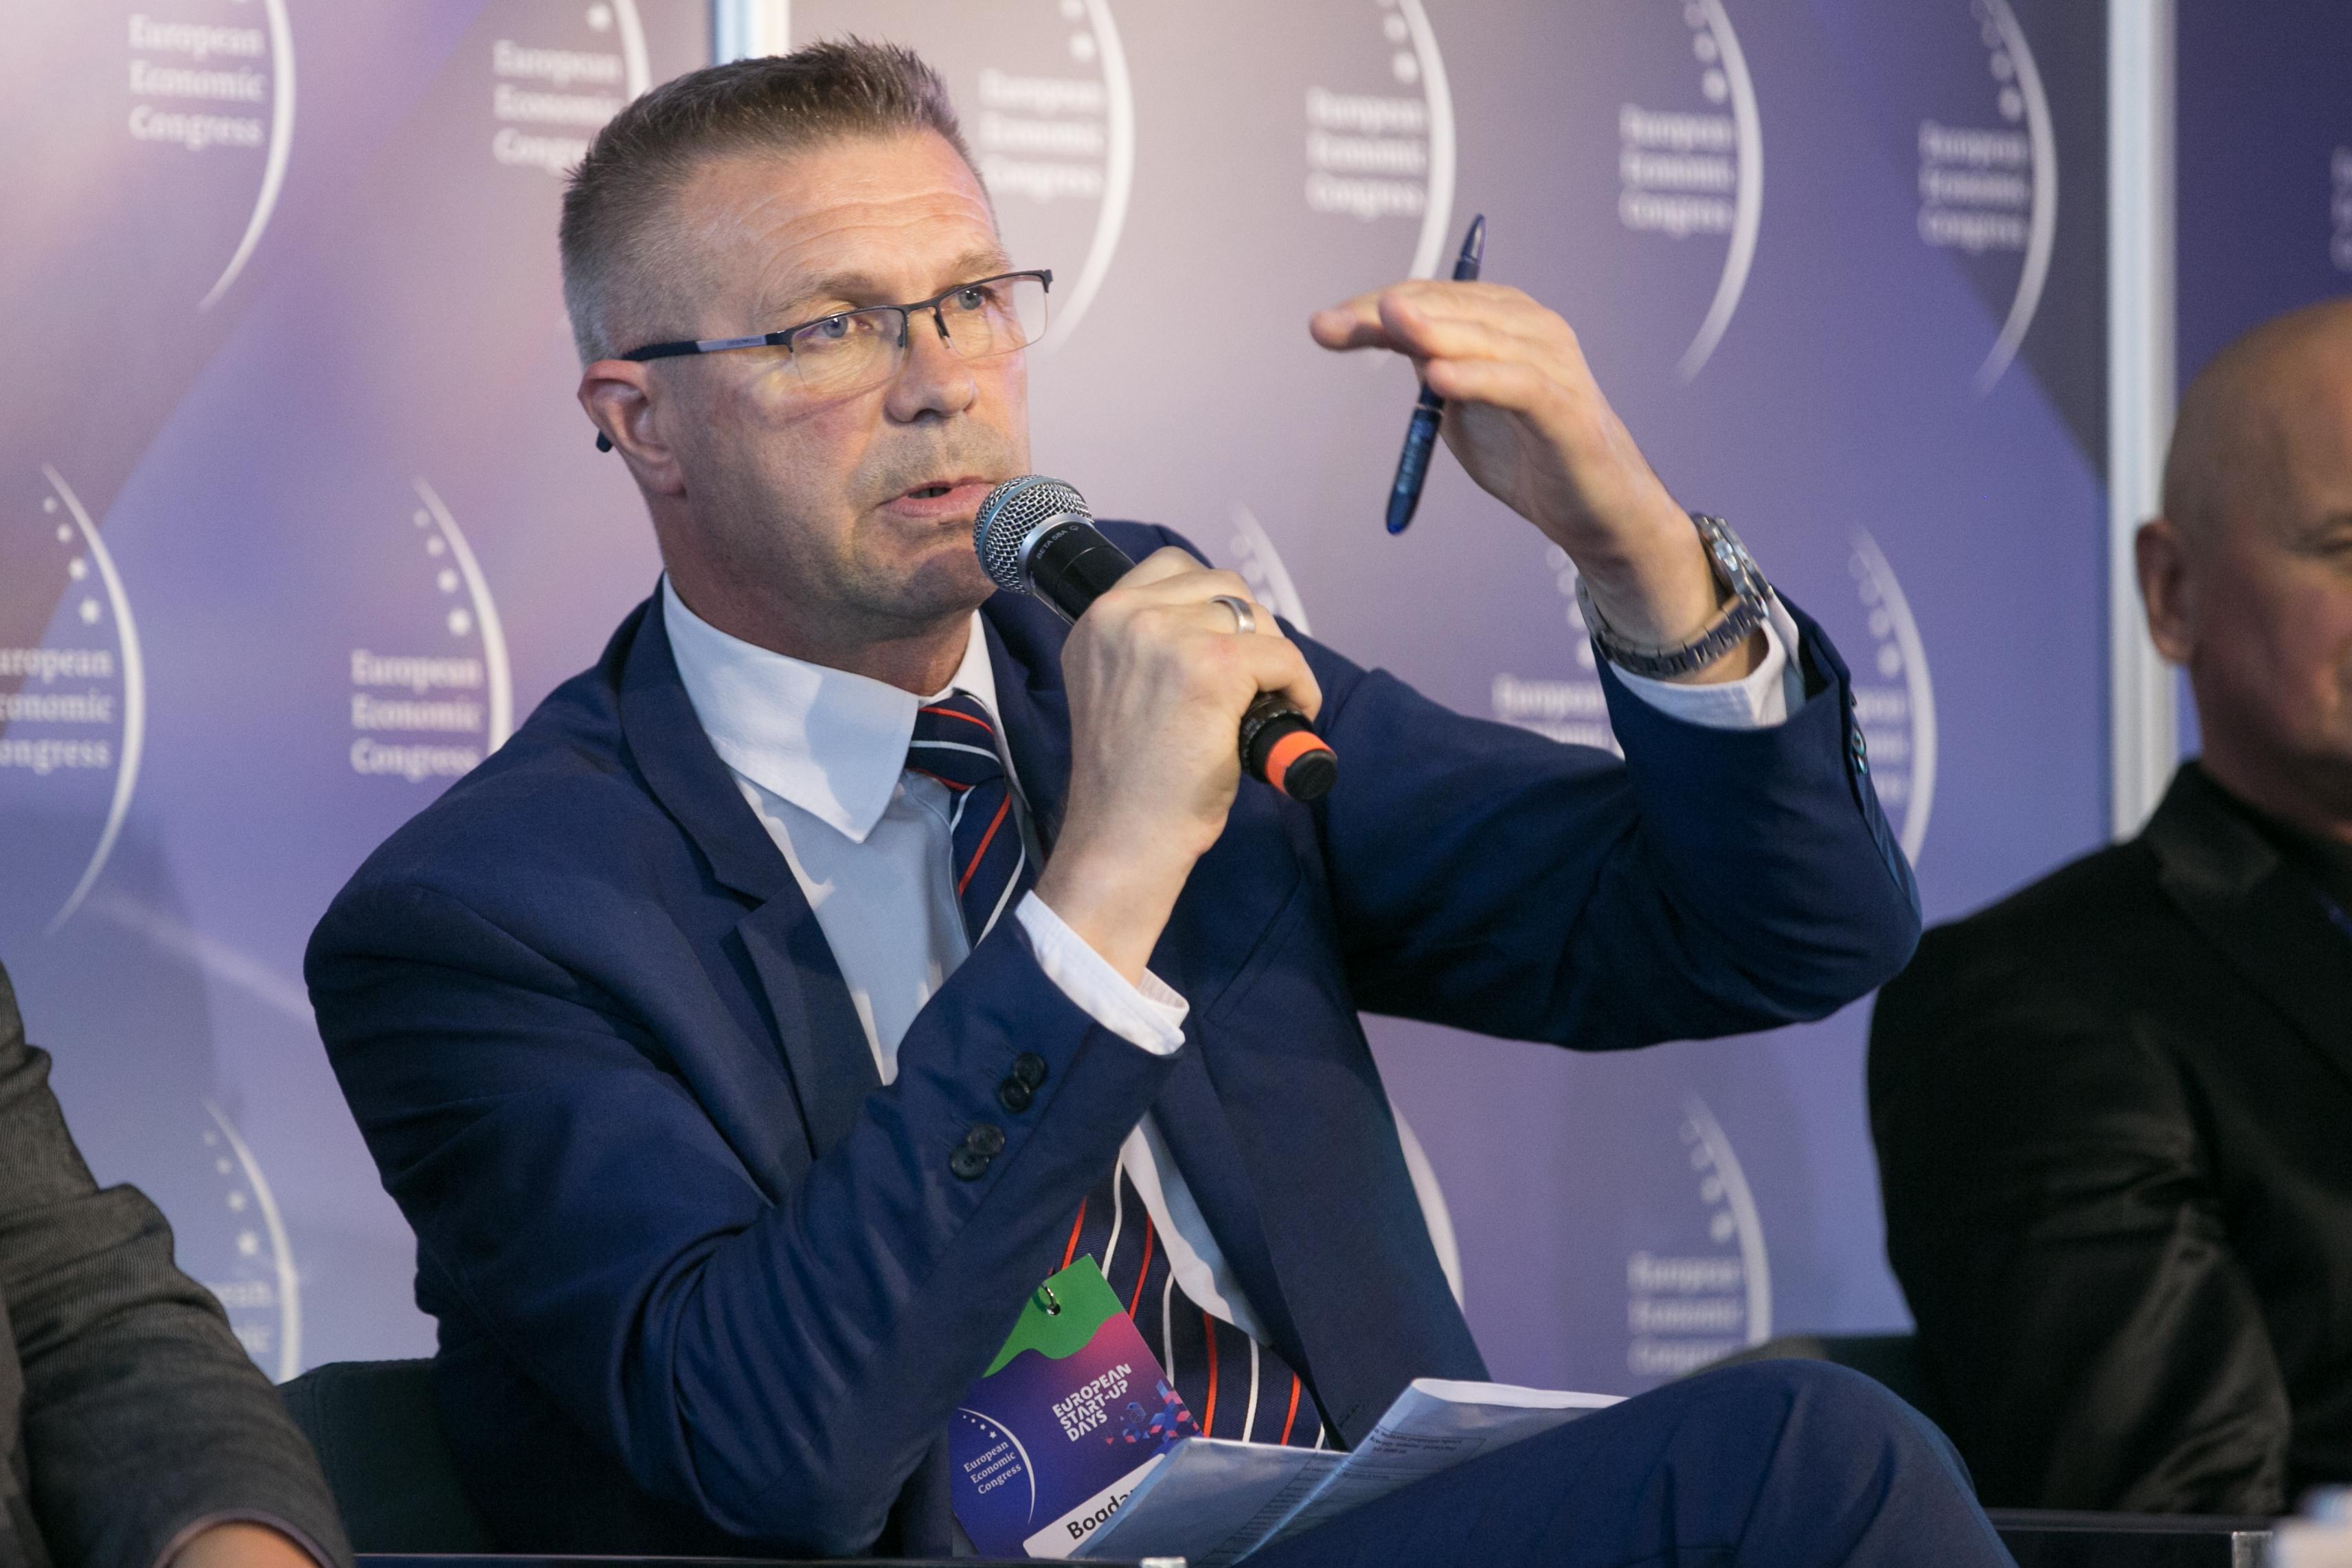 Bogdan Wenta, prezydent Kielc, fot. PTWP